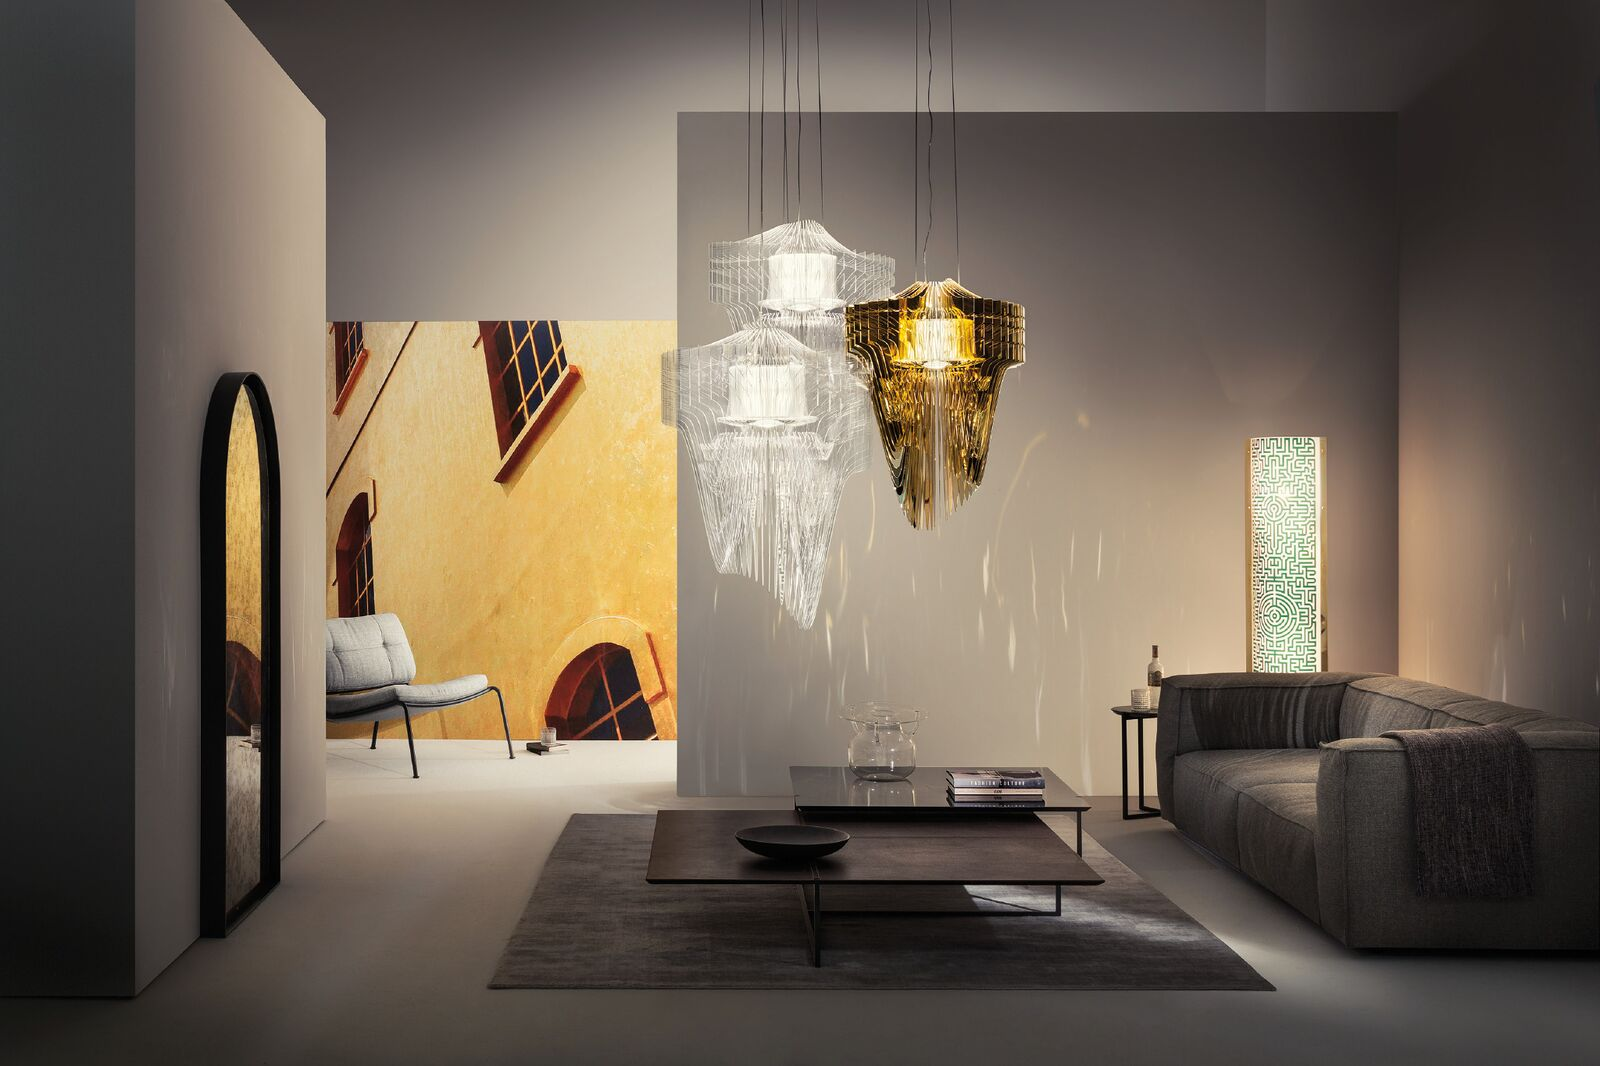 Lampa Aria Gold projektu Zahy Hadid